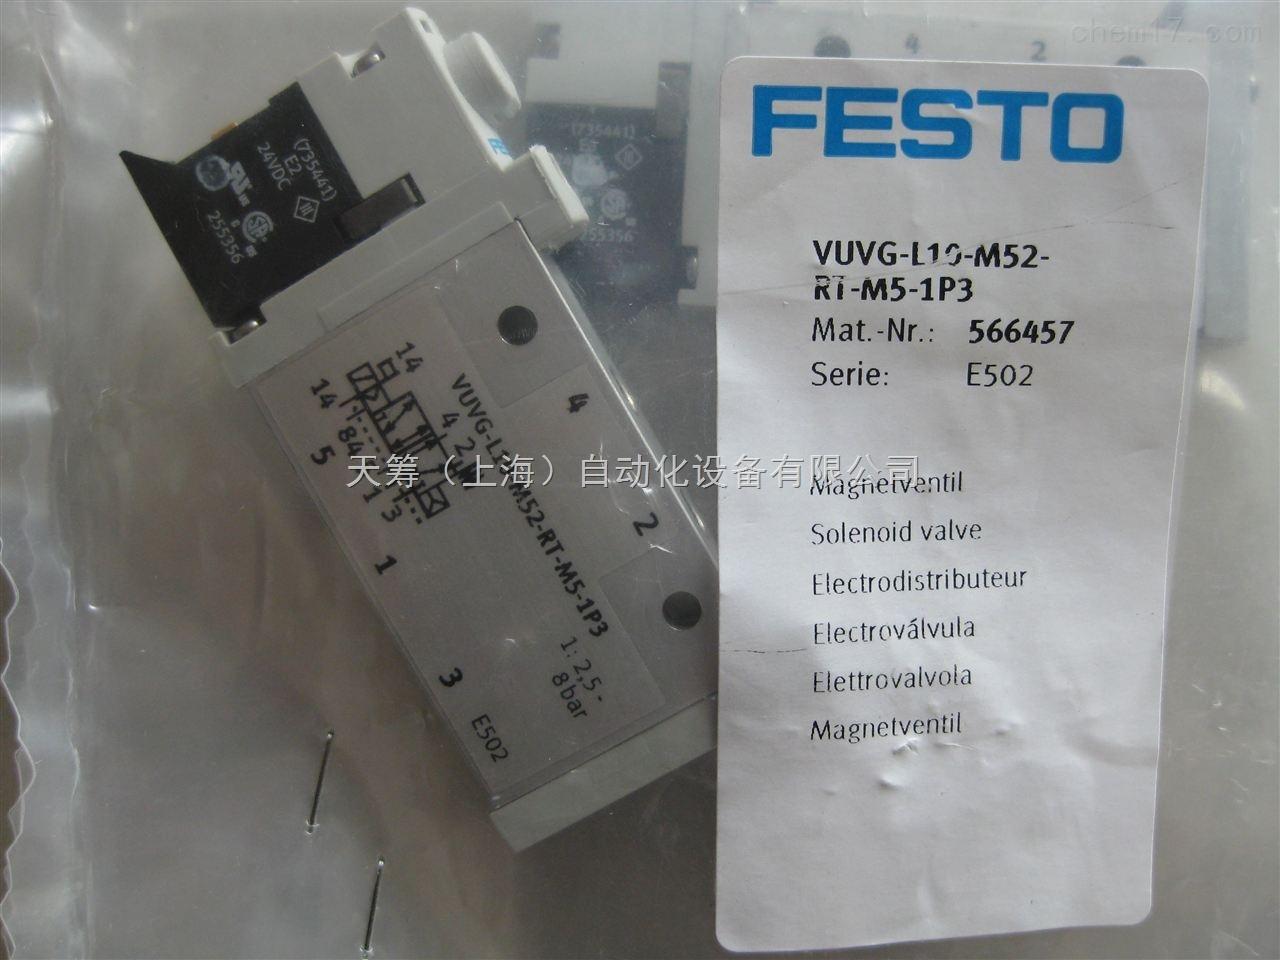 FESTO电磁阀VUVG-L10-M52-RT-M5-1P3